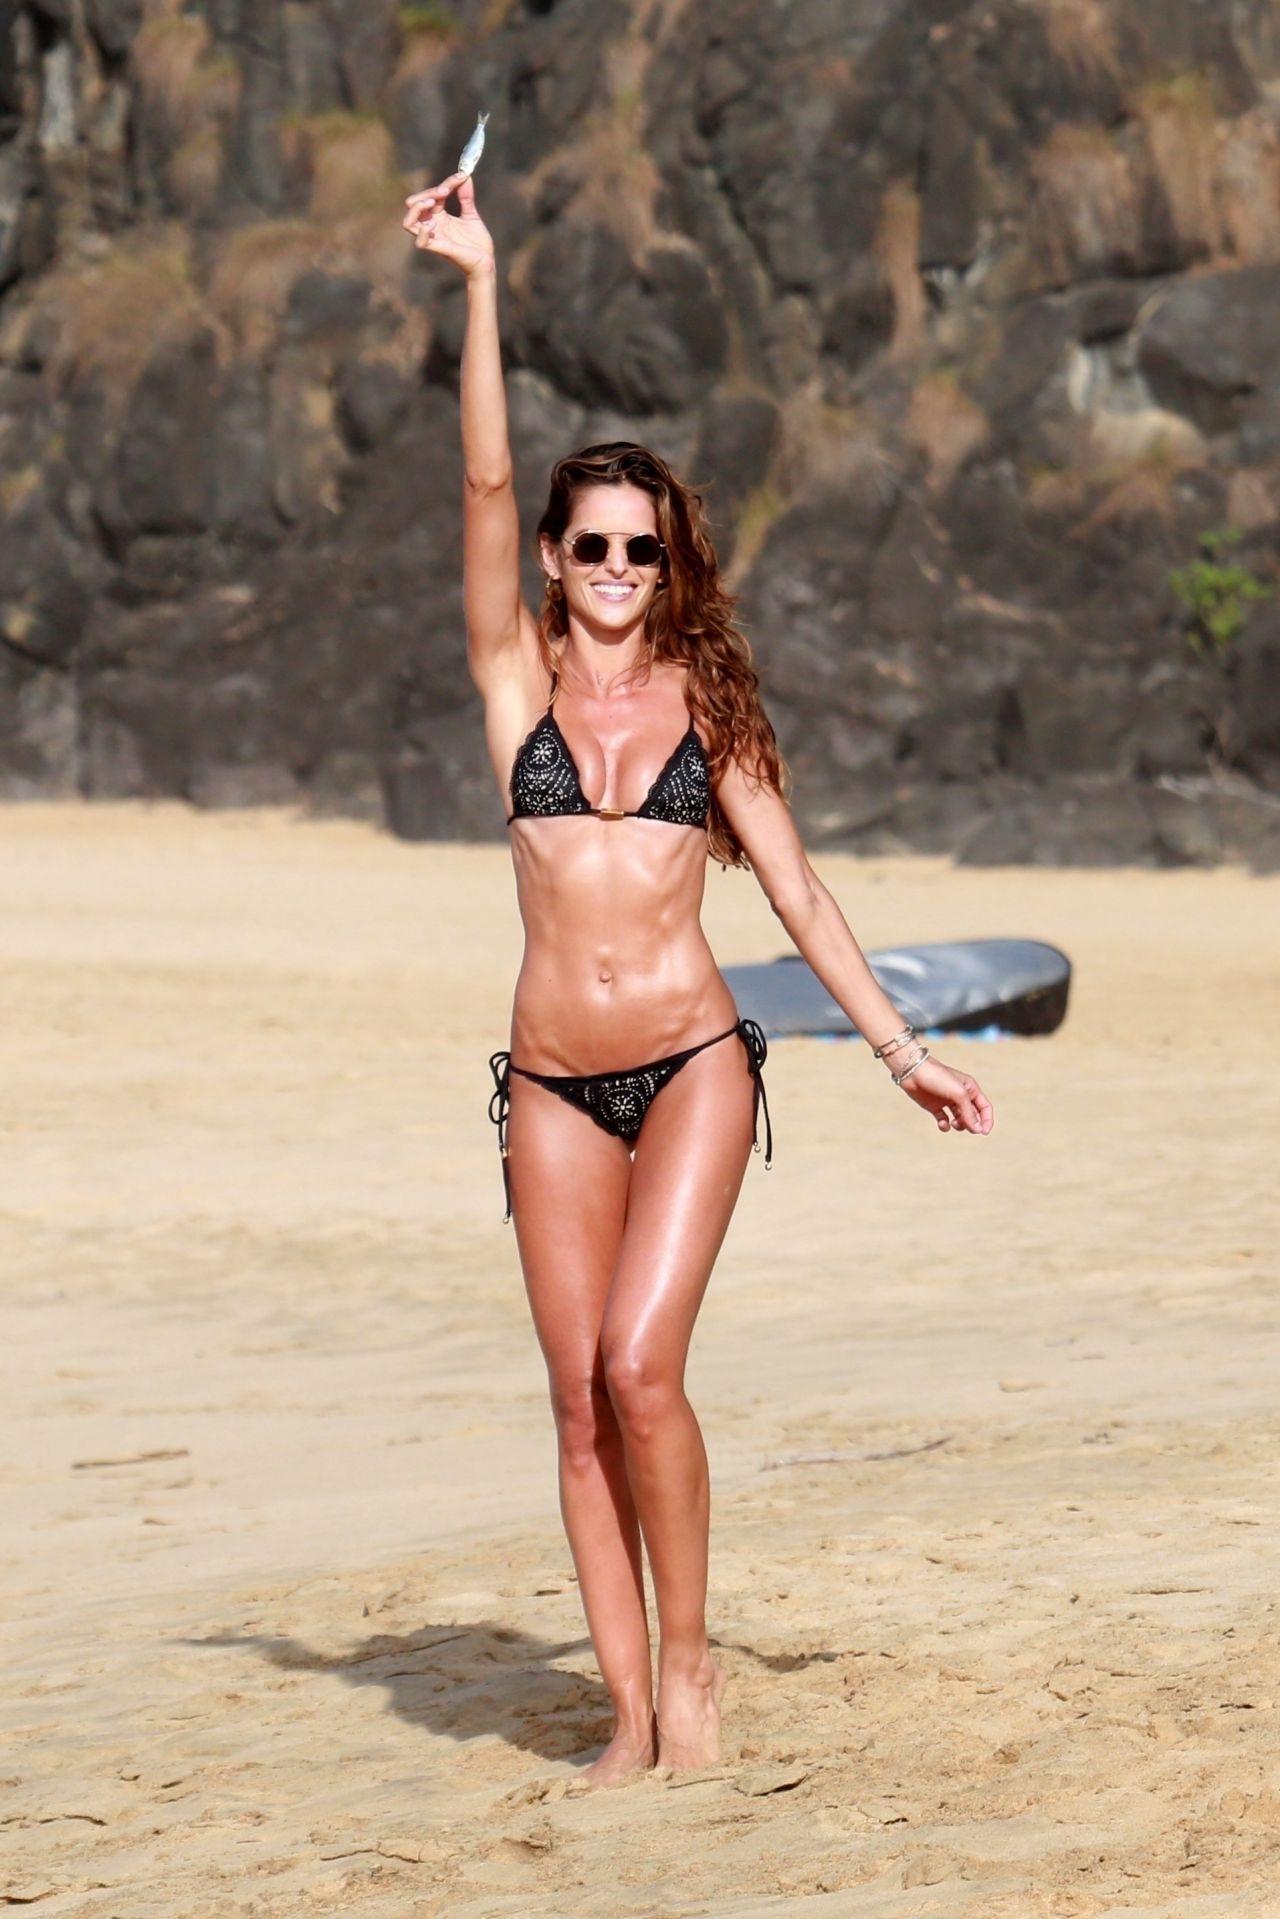 Izabel Goulart in Bikini at Cacimba Do Padre Beach in Fernando De Noronha Pic 10 of 35